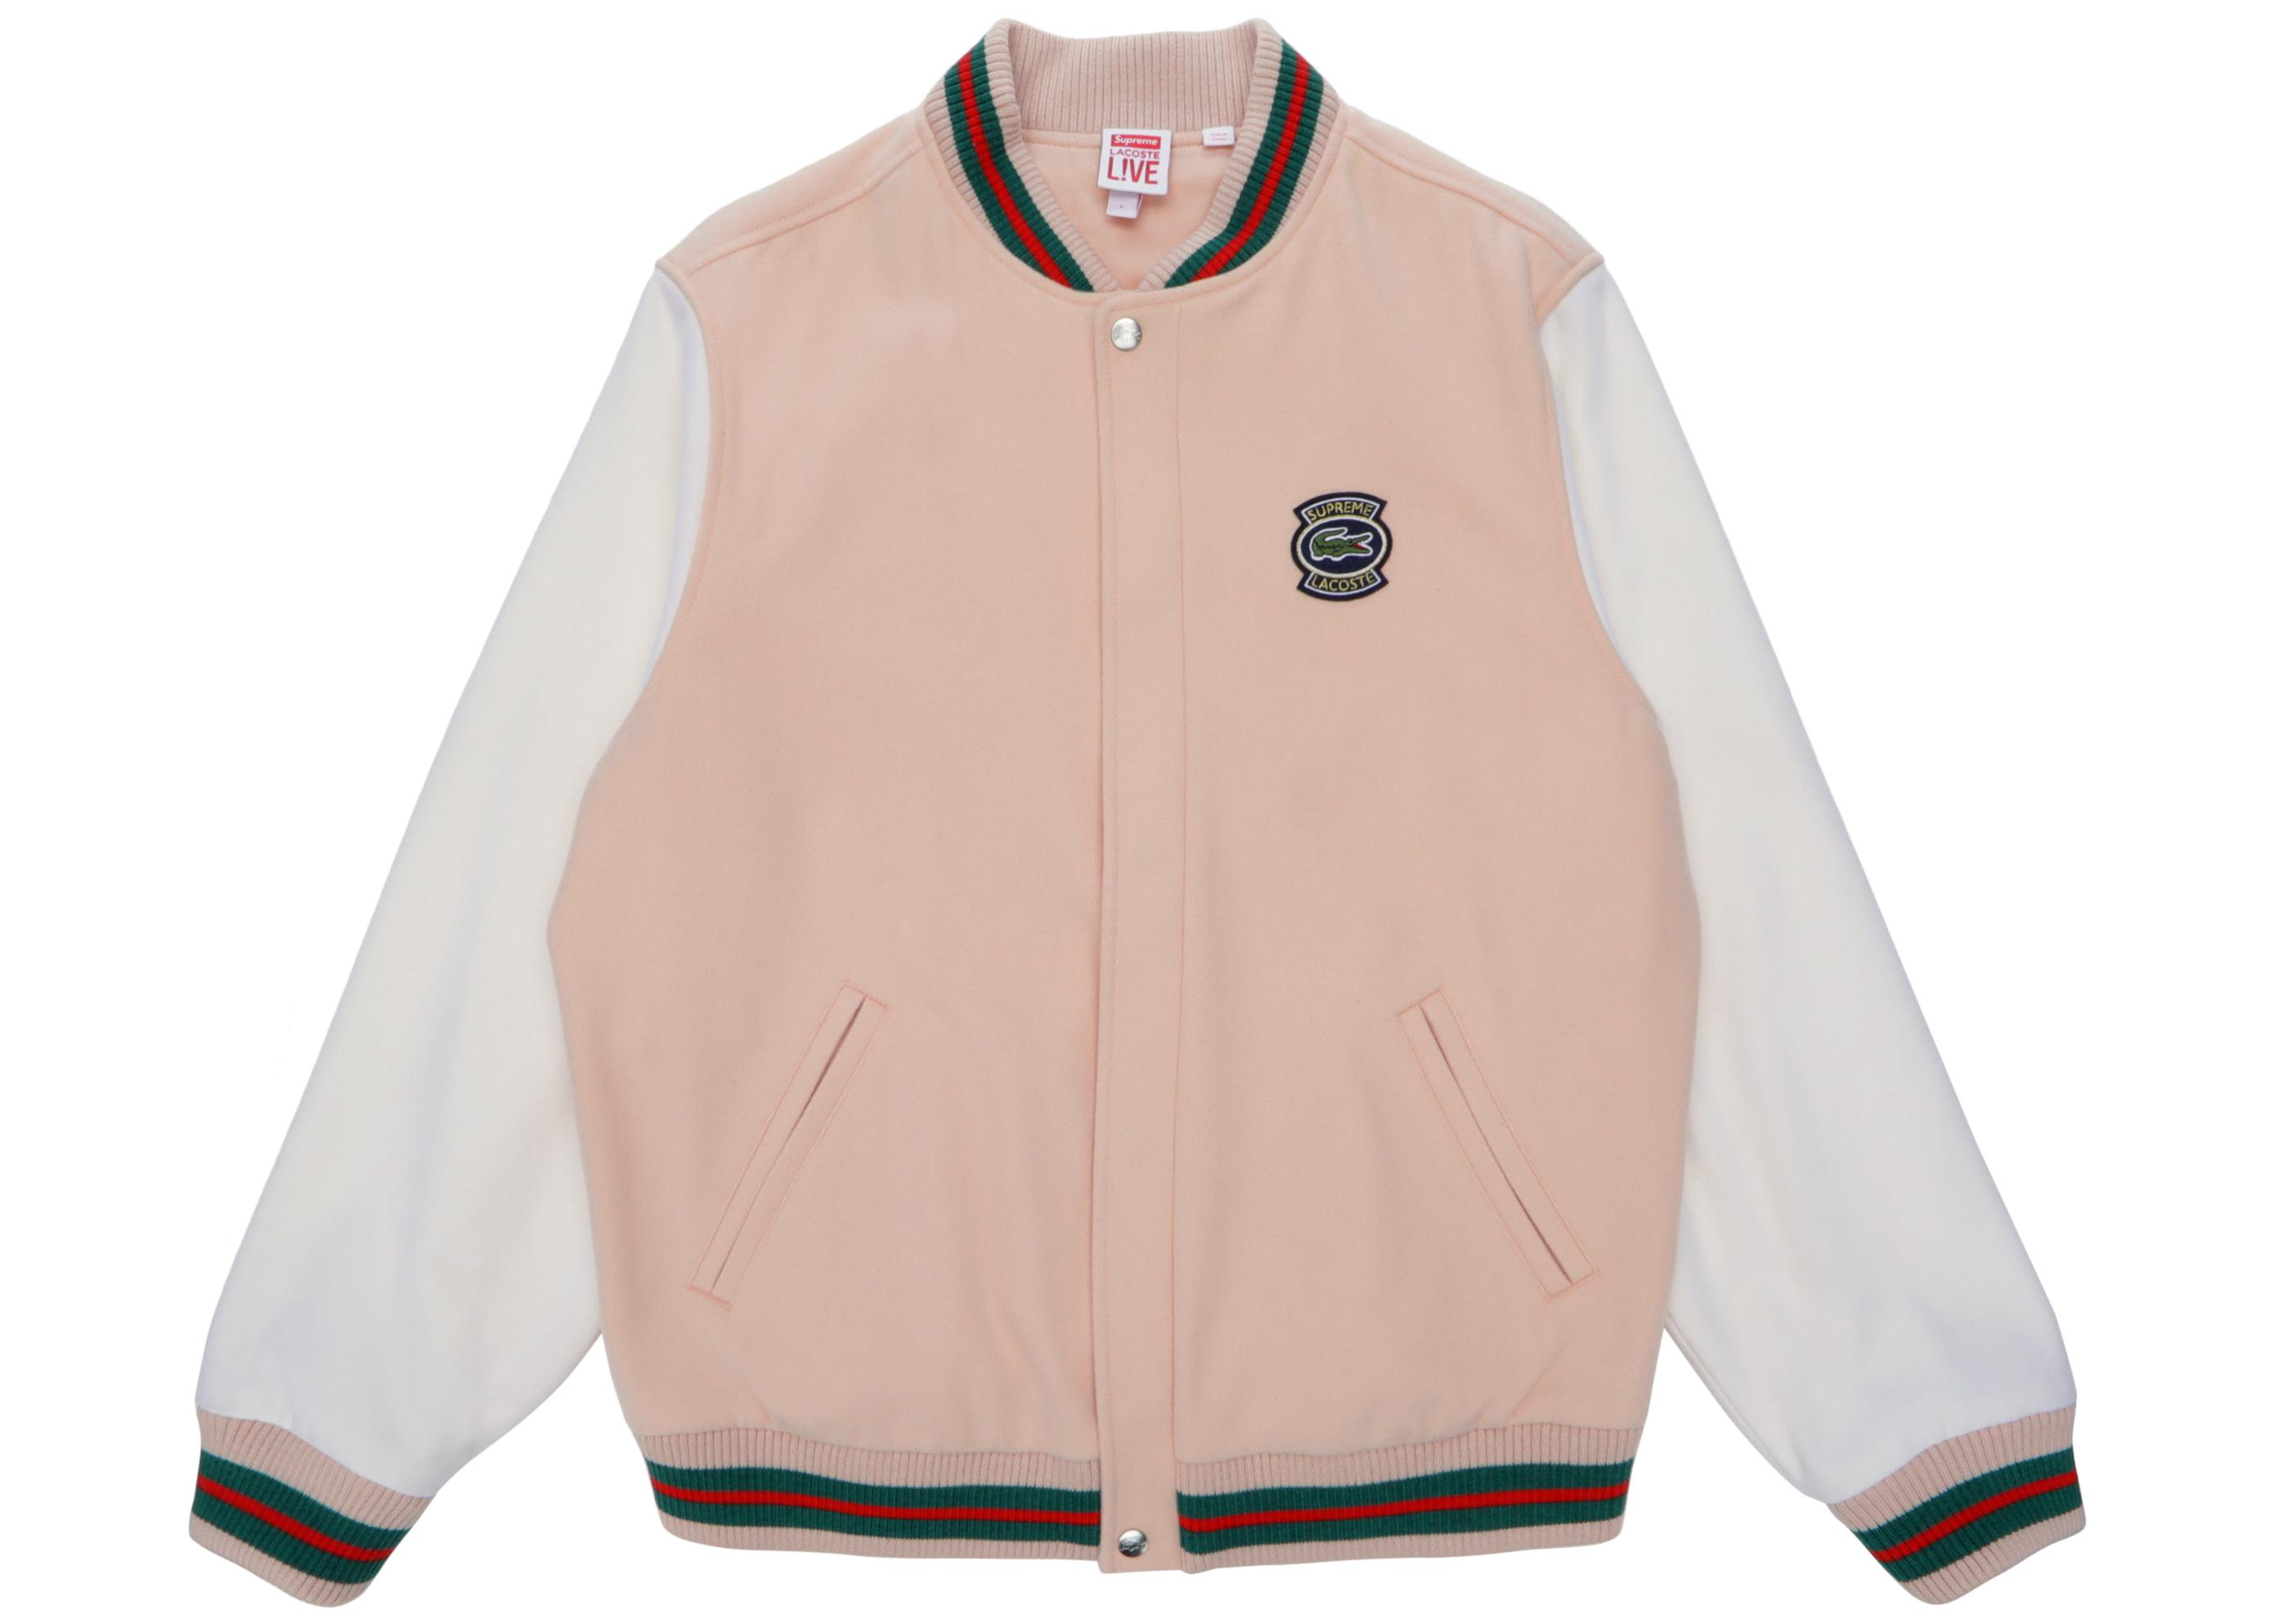 18e7a75826623 Supreme - Multicolor Lacoste Wool Varsity Jacket for Men - Lyst. View  fullscreen